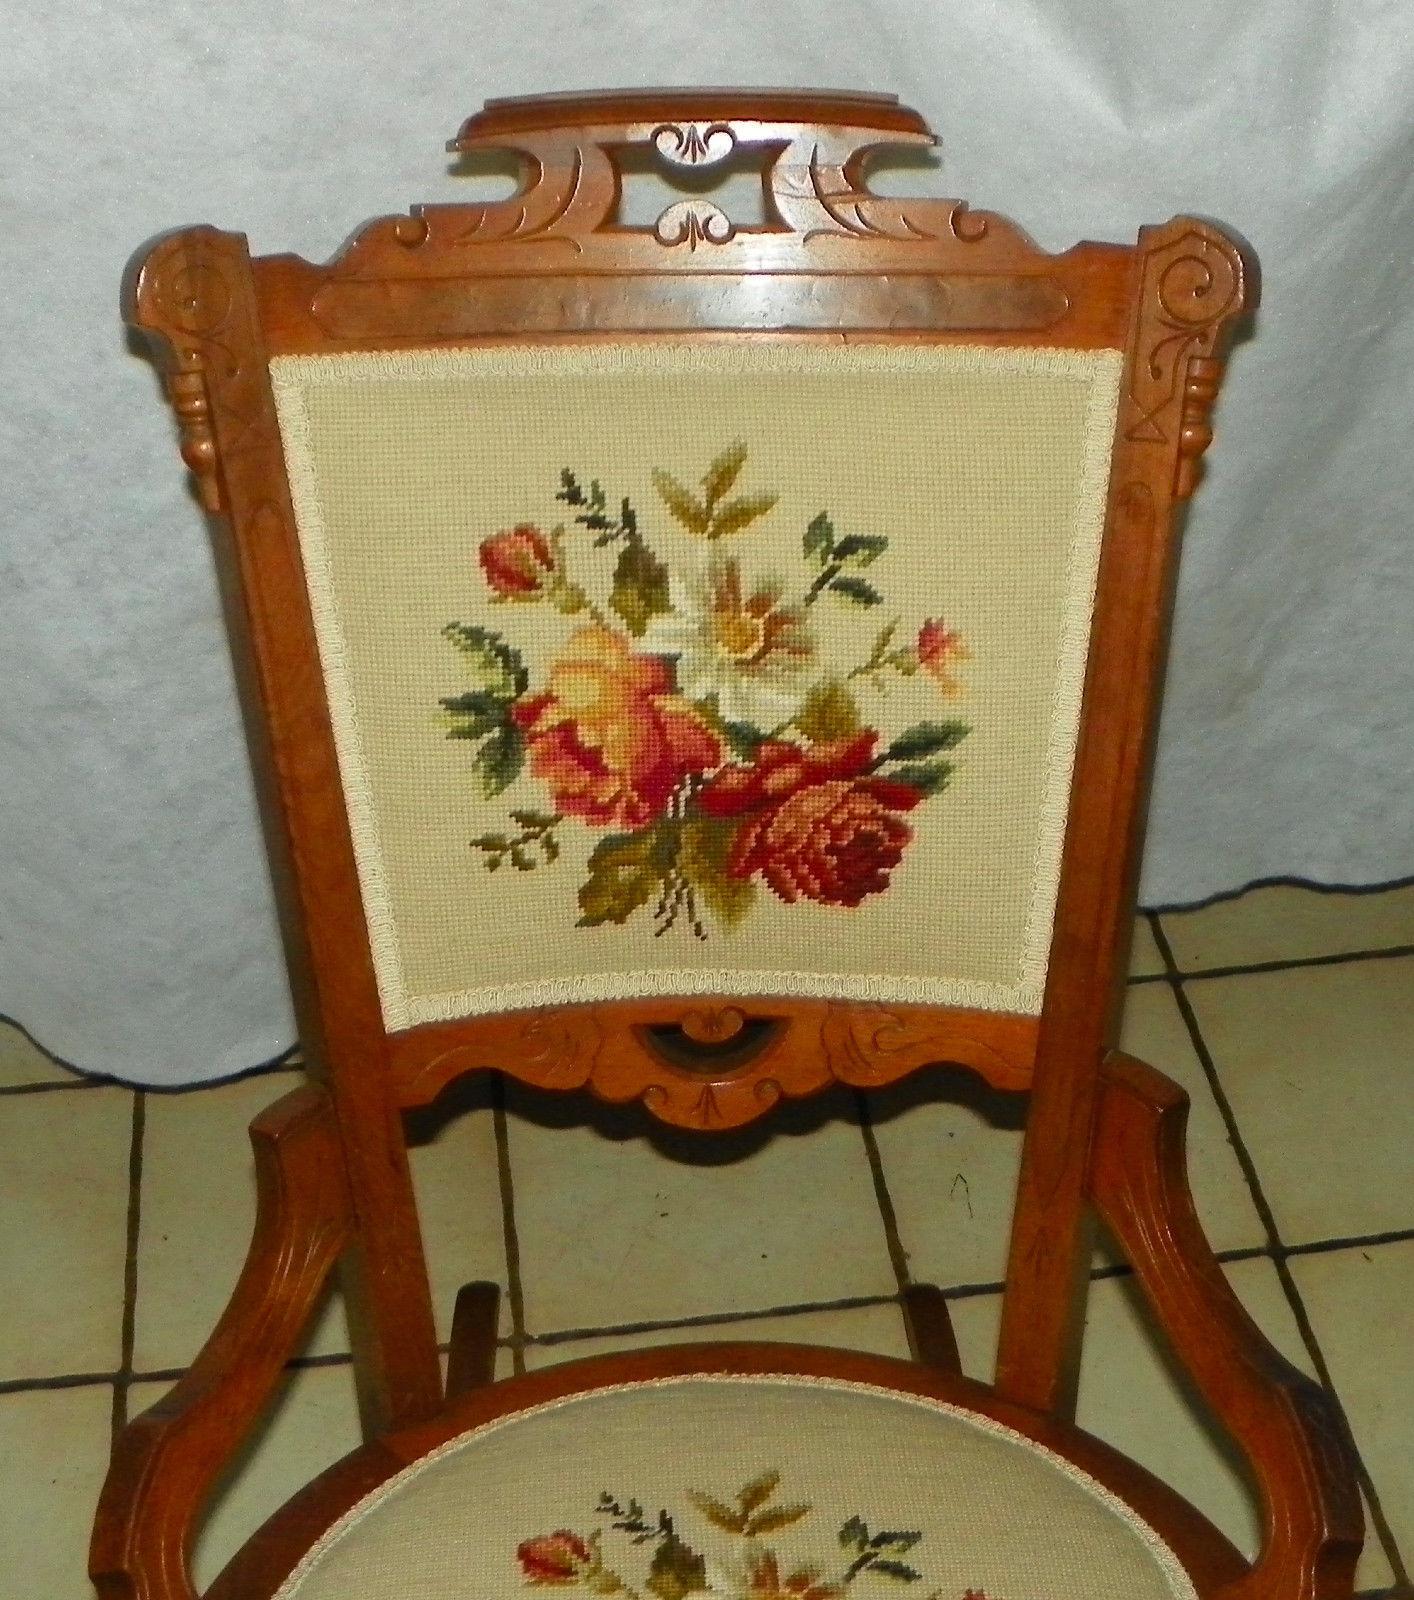 Walnut Carved Eastlake Sewing Rocker / Rocking Chair (BH) - Post-1950